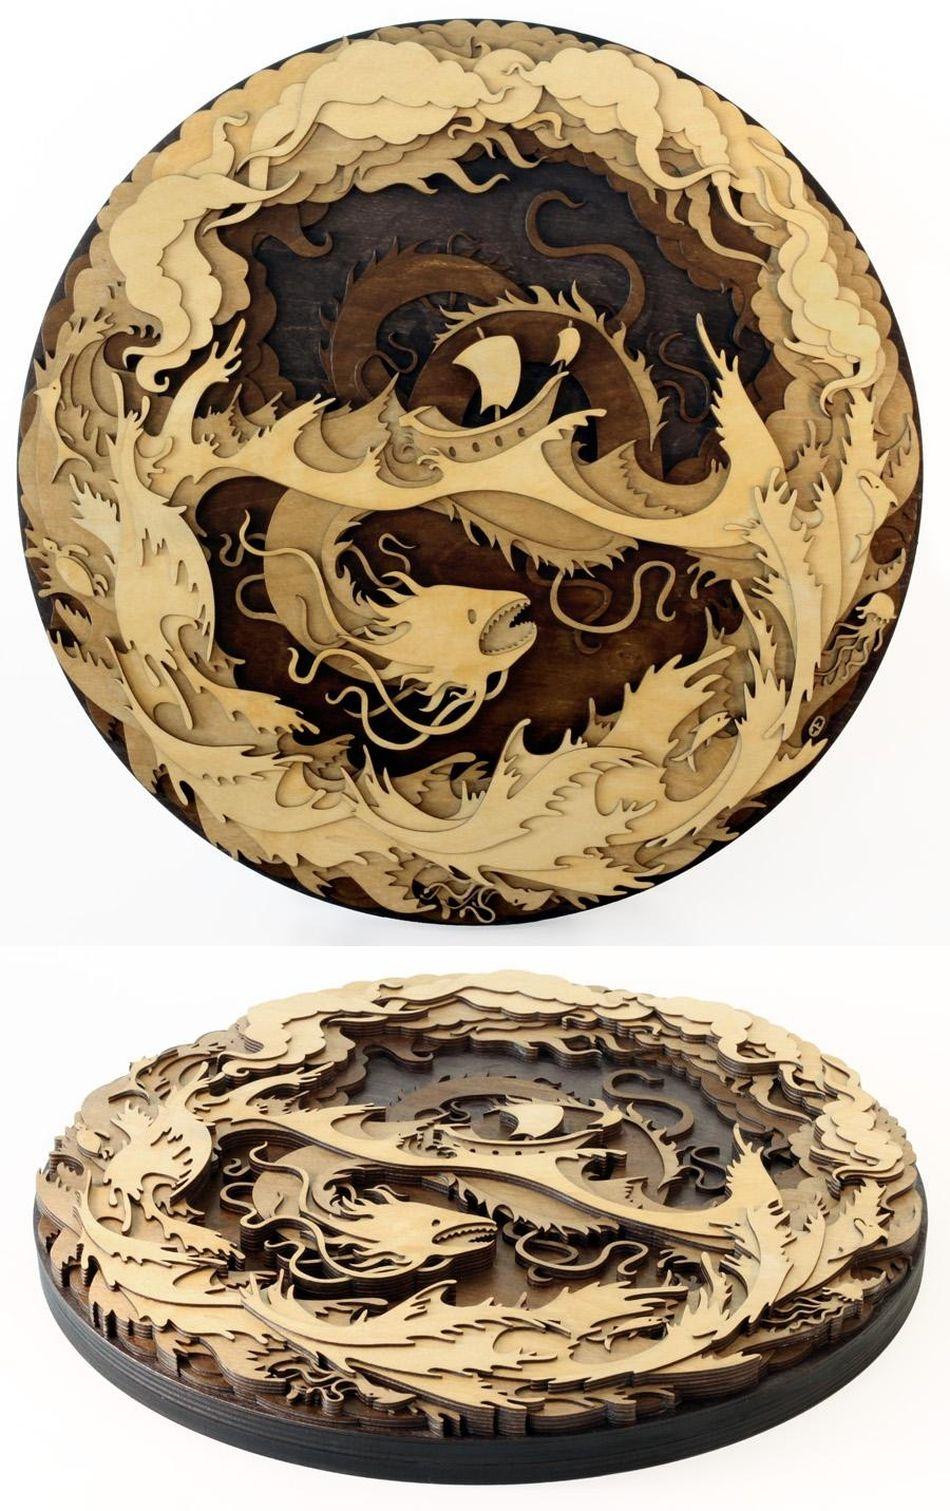 Martin Tomsky laser cut wood sea serpent